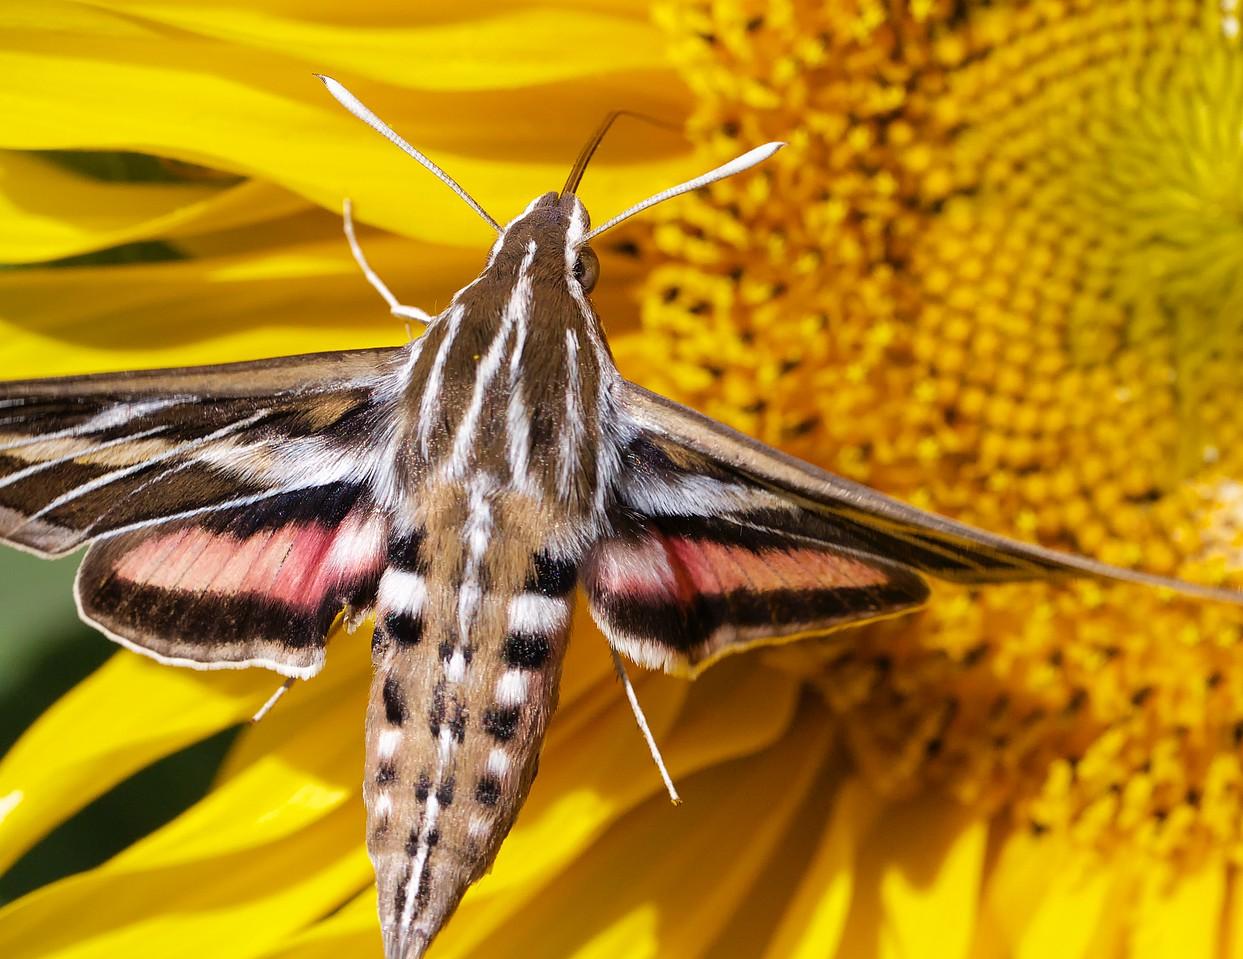 Whitelined sphinx moth in flight